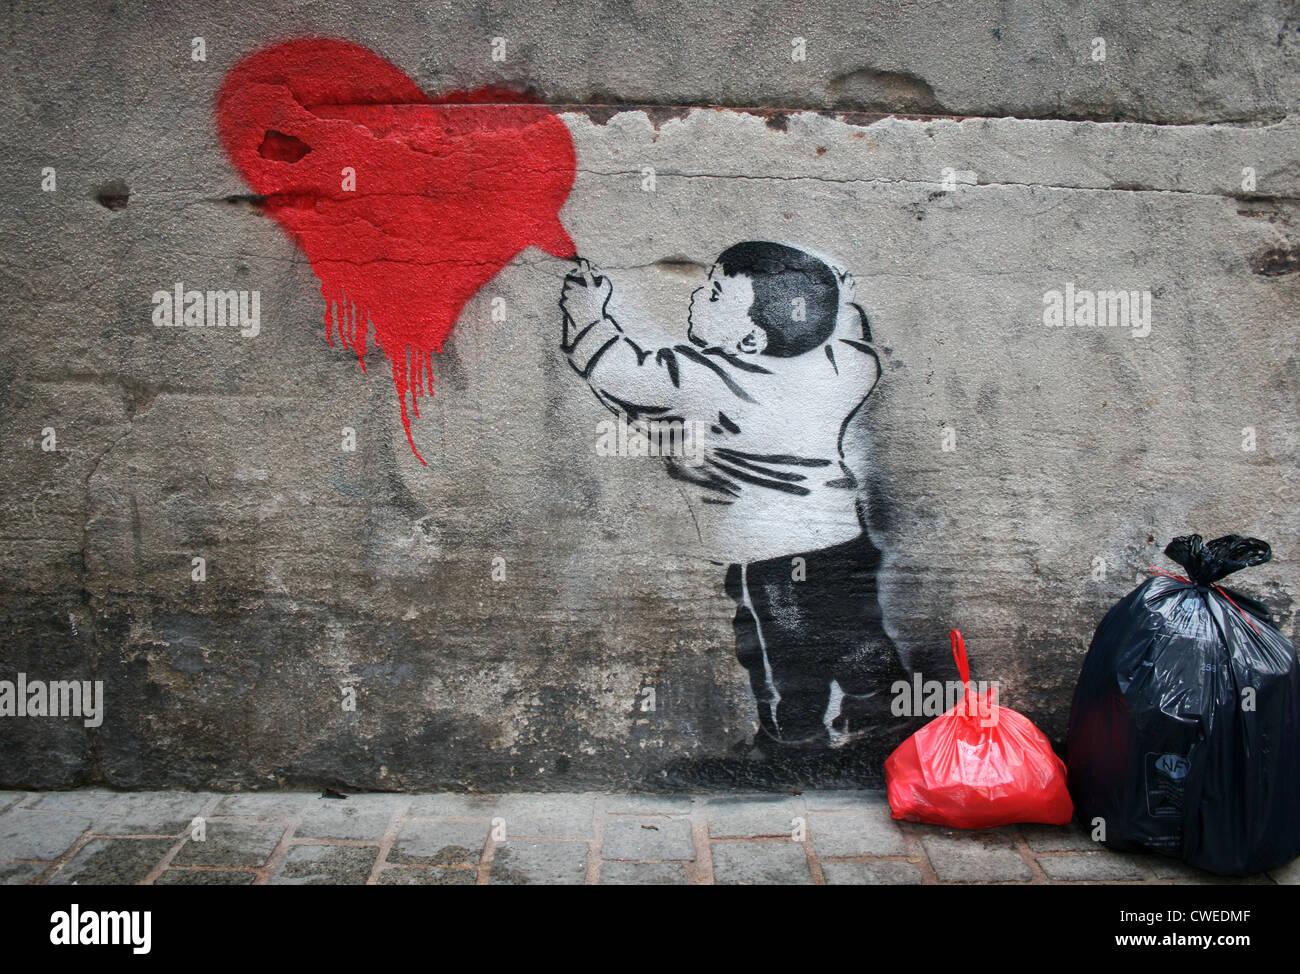 La pulvérisation,coeur,graffiti,streetart Photo Stock